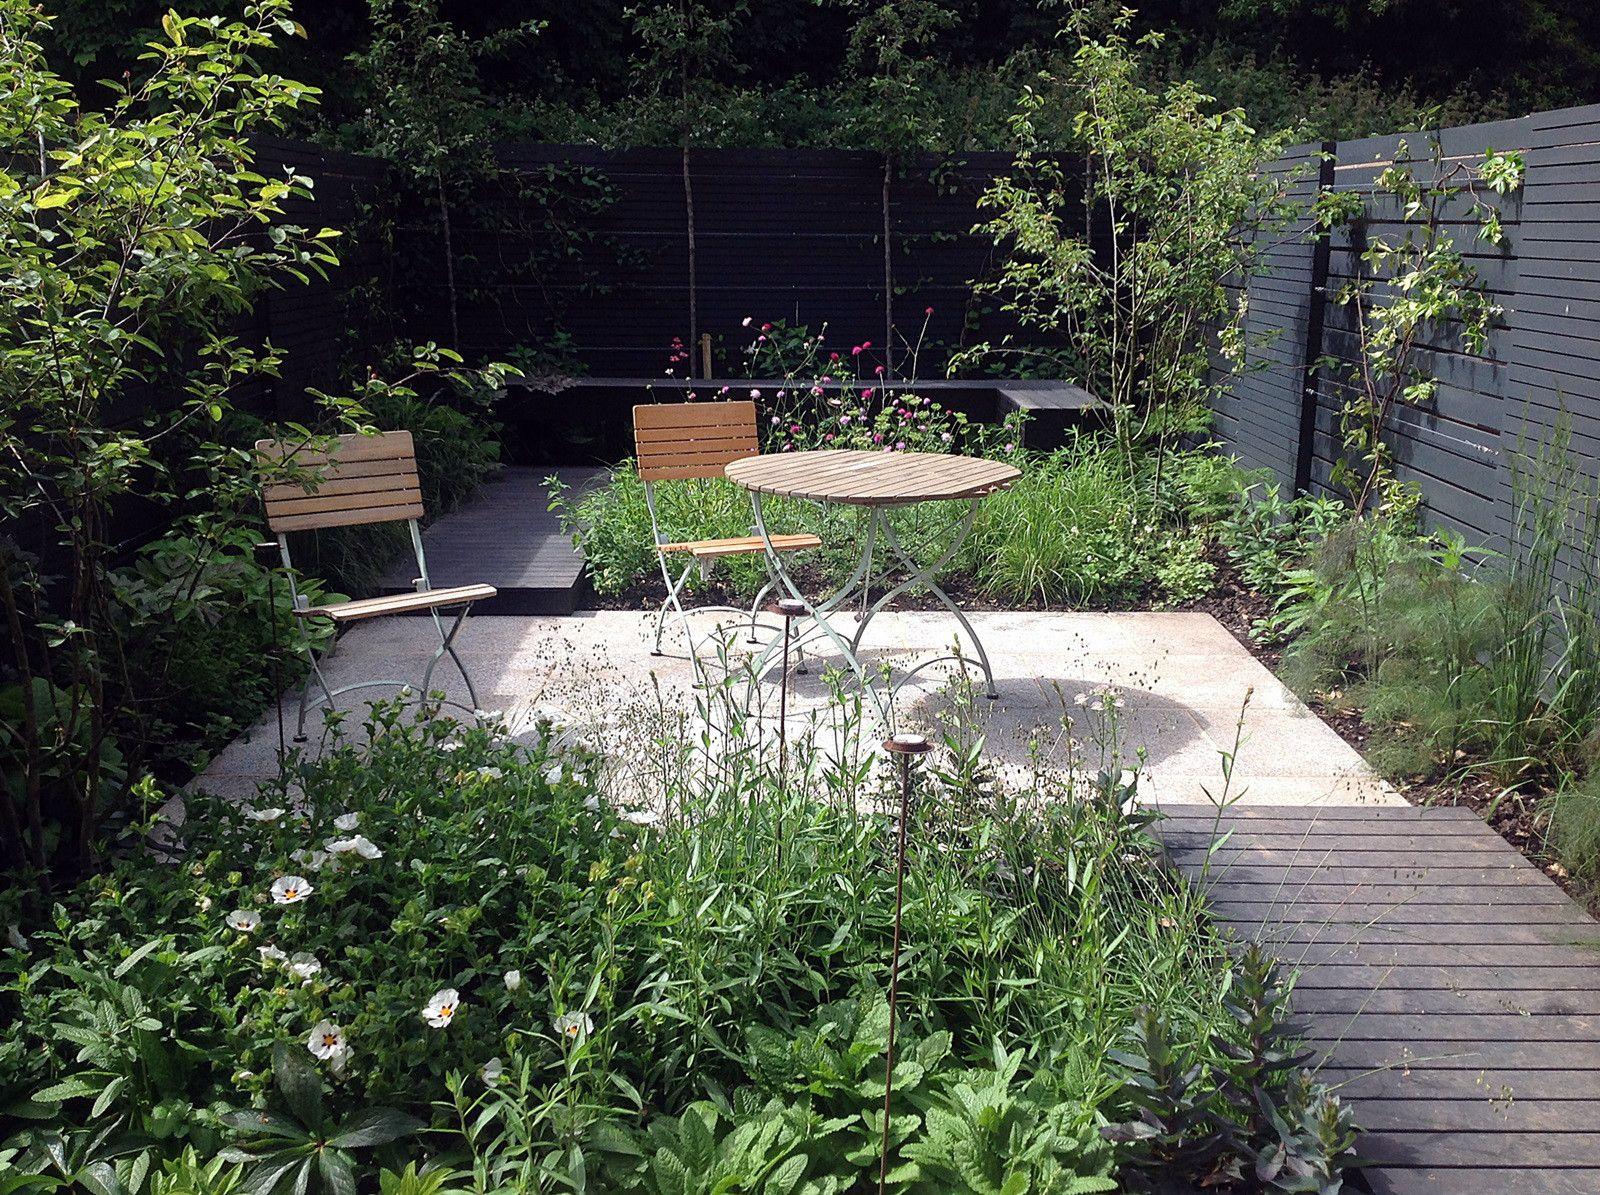 Delicieux Anewgarden | Garden Builder Gallery